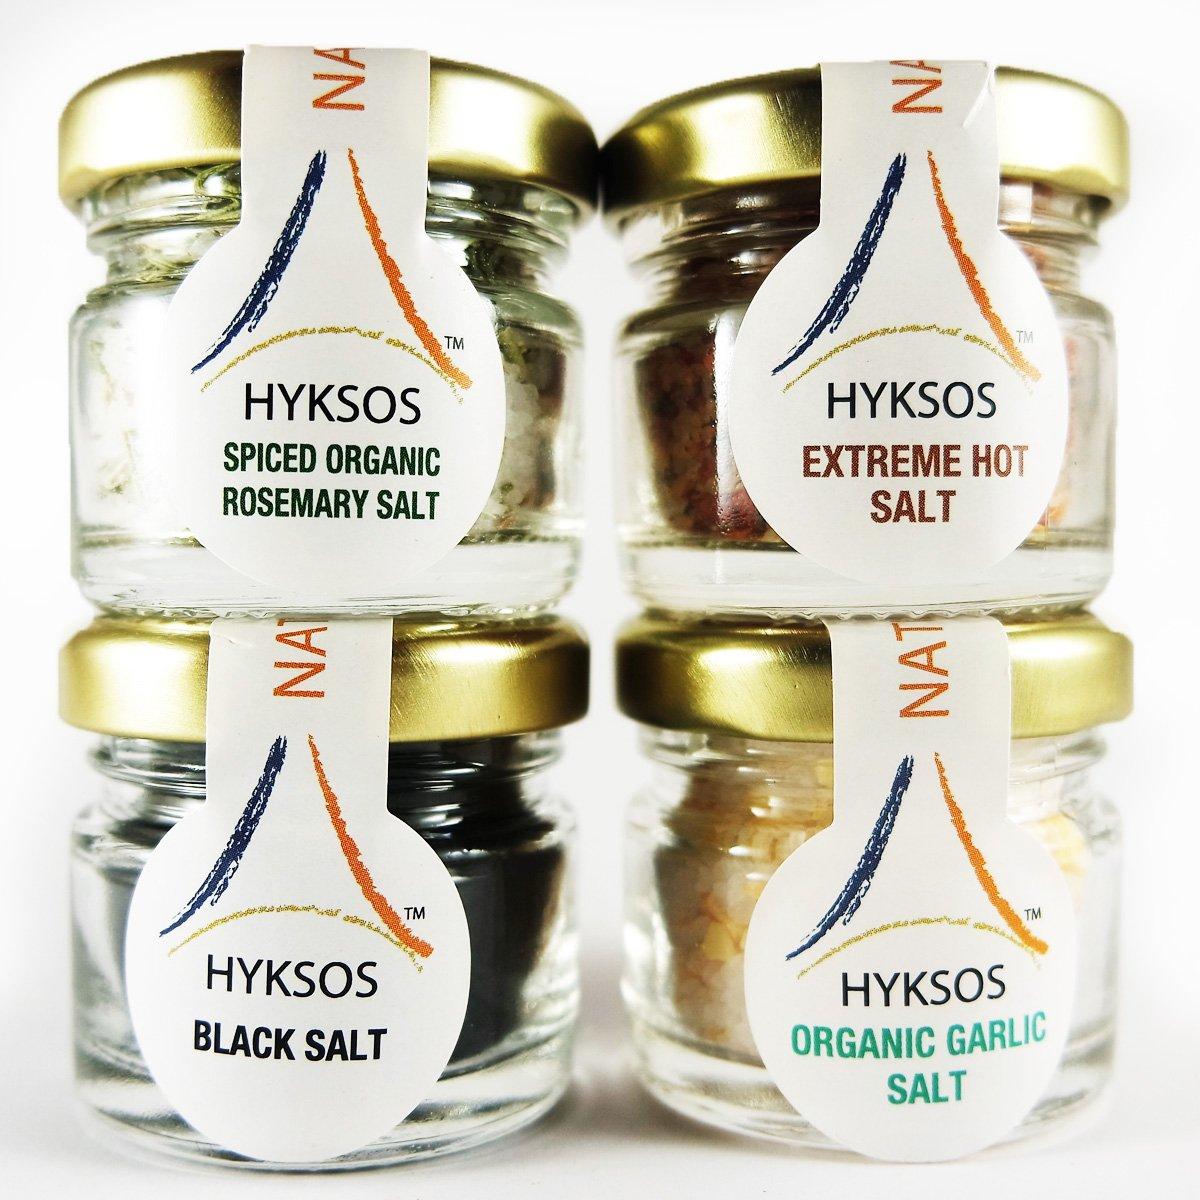 Hyksos Dead Sea Edible Flavored Coarse Salt Set – Spiced Organic Rosemary Salt & Wild Fire Salt (Extreme Hot Salt) & Black Salt & Organic Garlic Salt 1.2oz x 4 Jars